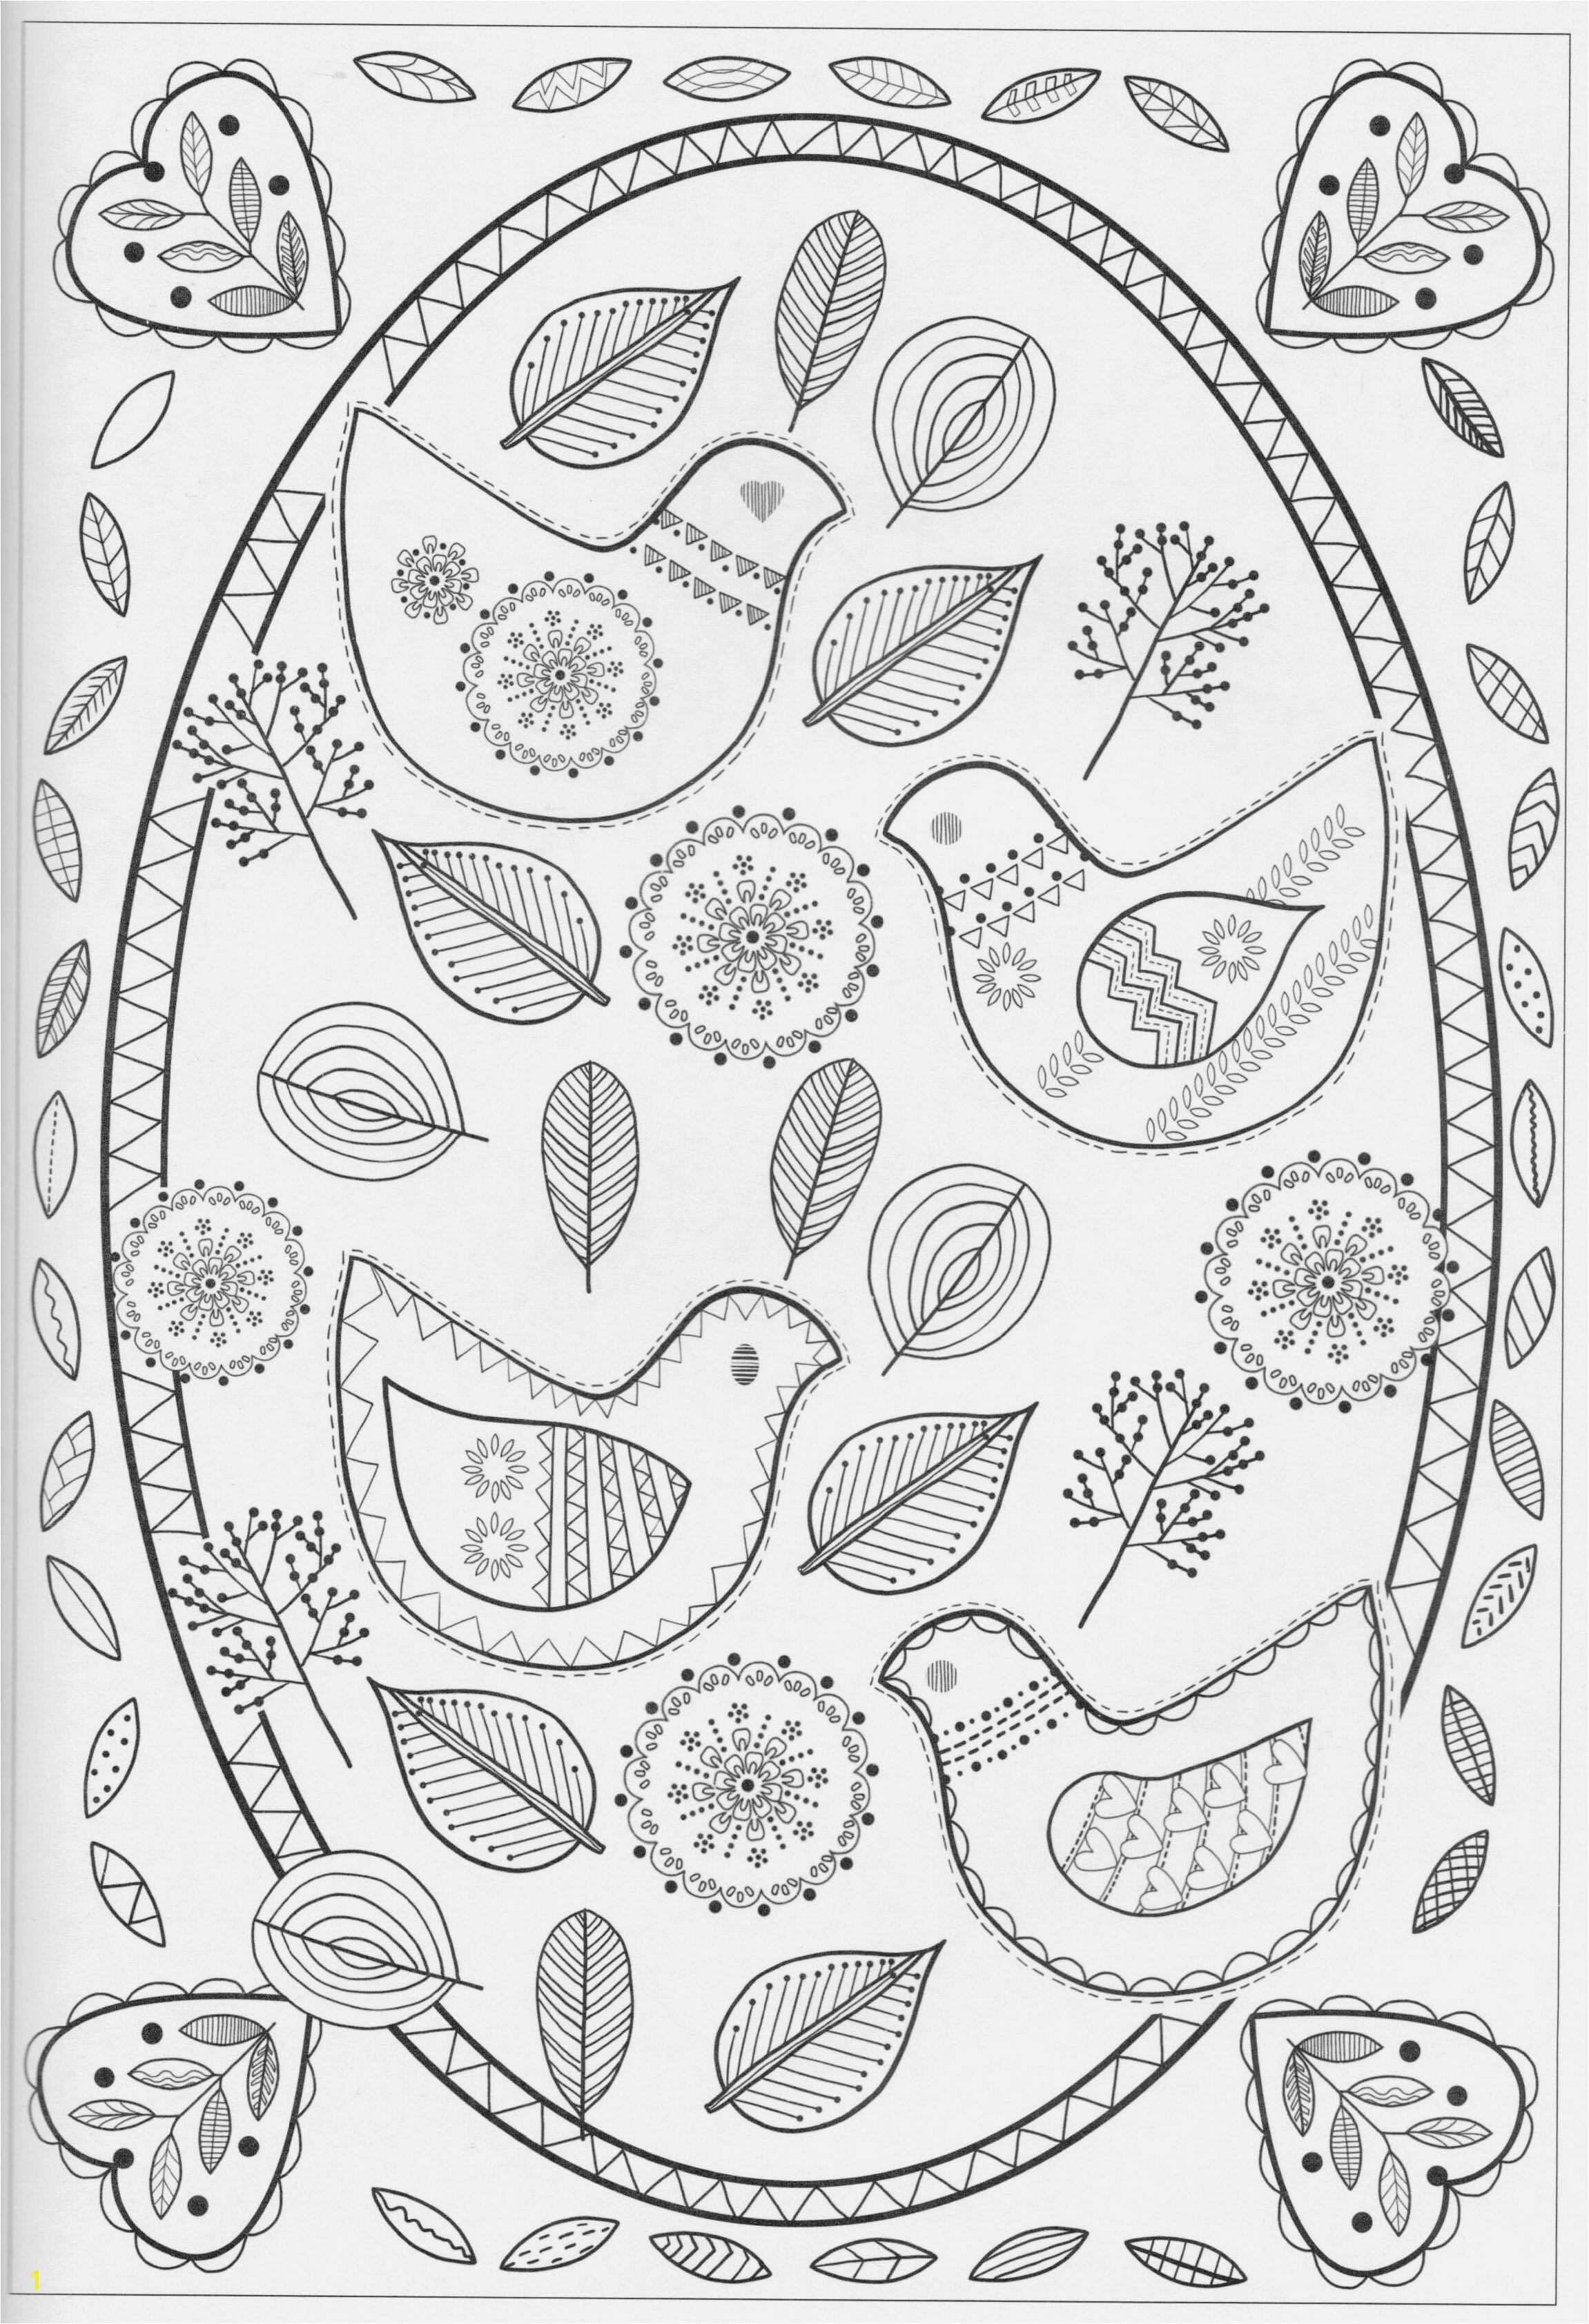 Parrot Coloring Pages Coloring Pages Parrots Coloring Pages Animals New to Color Parrot Coloring Pages